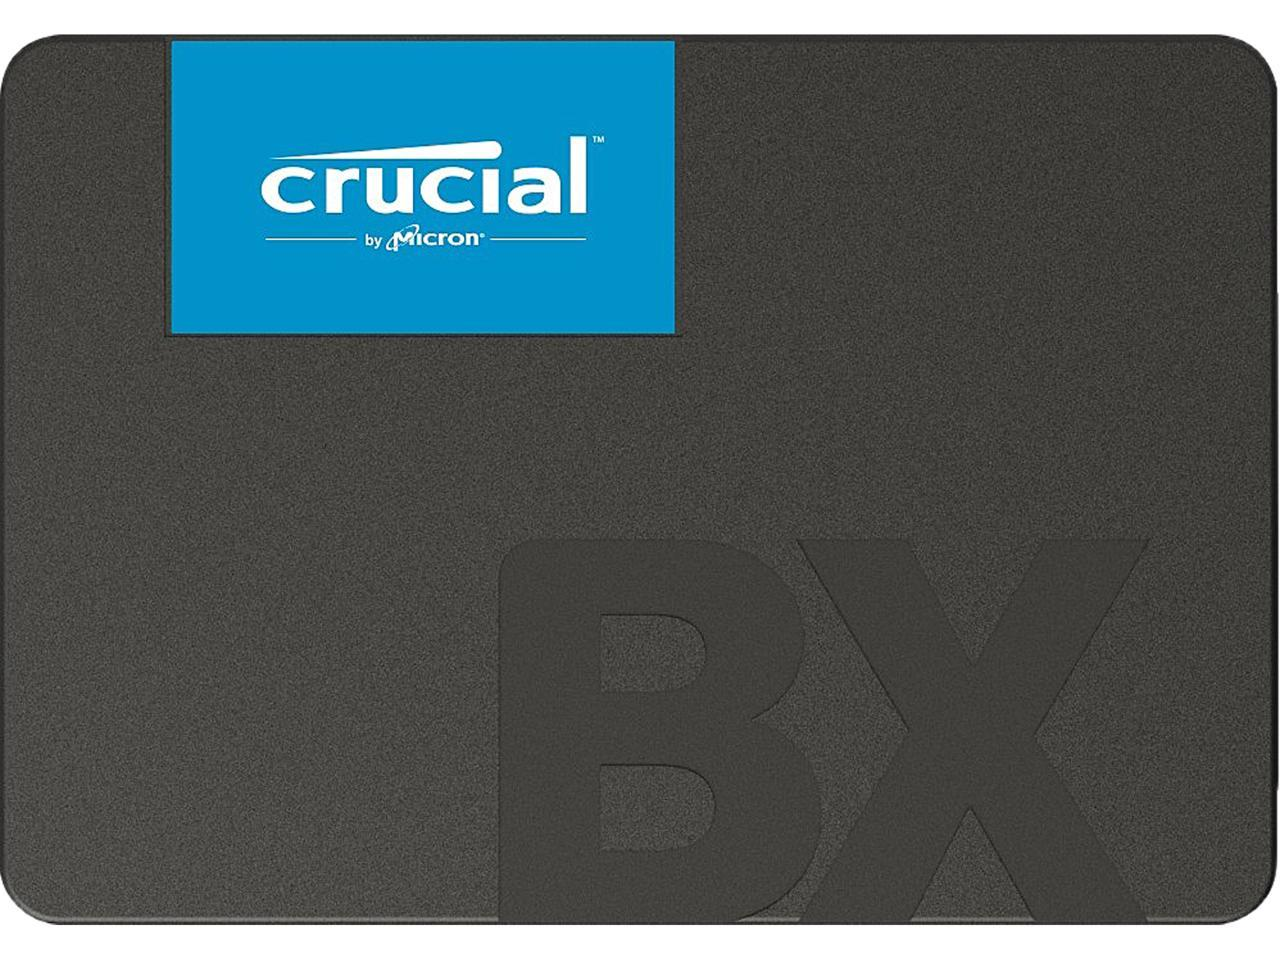 Crucial BX500 1TB 3D NAND SATA 2.5-Inch Internal SSD